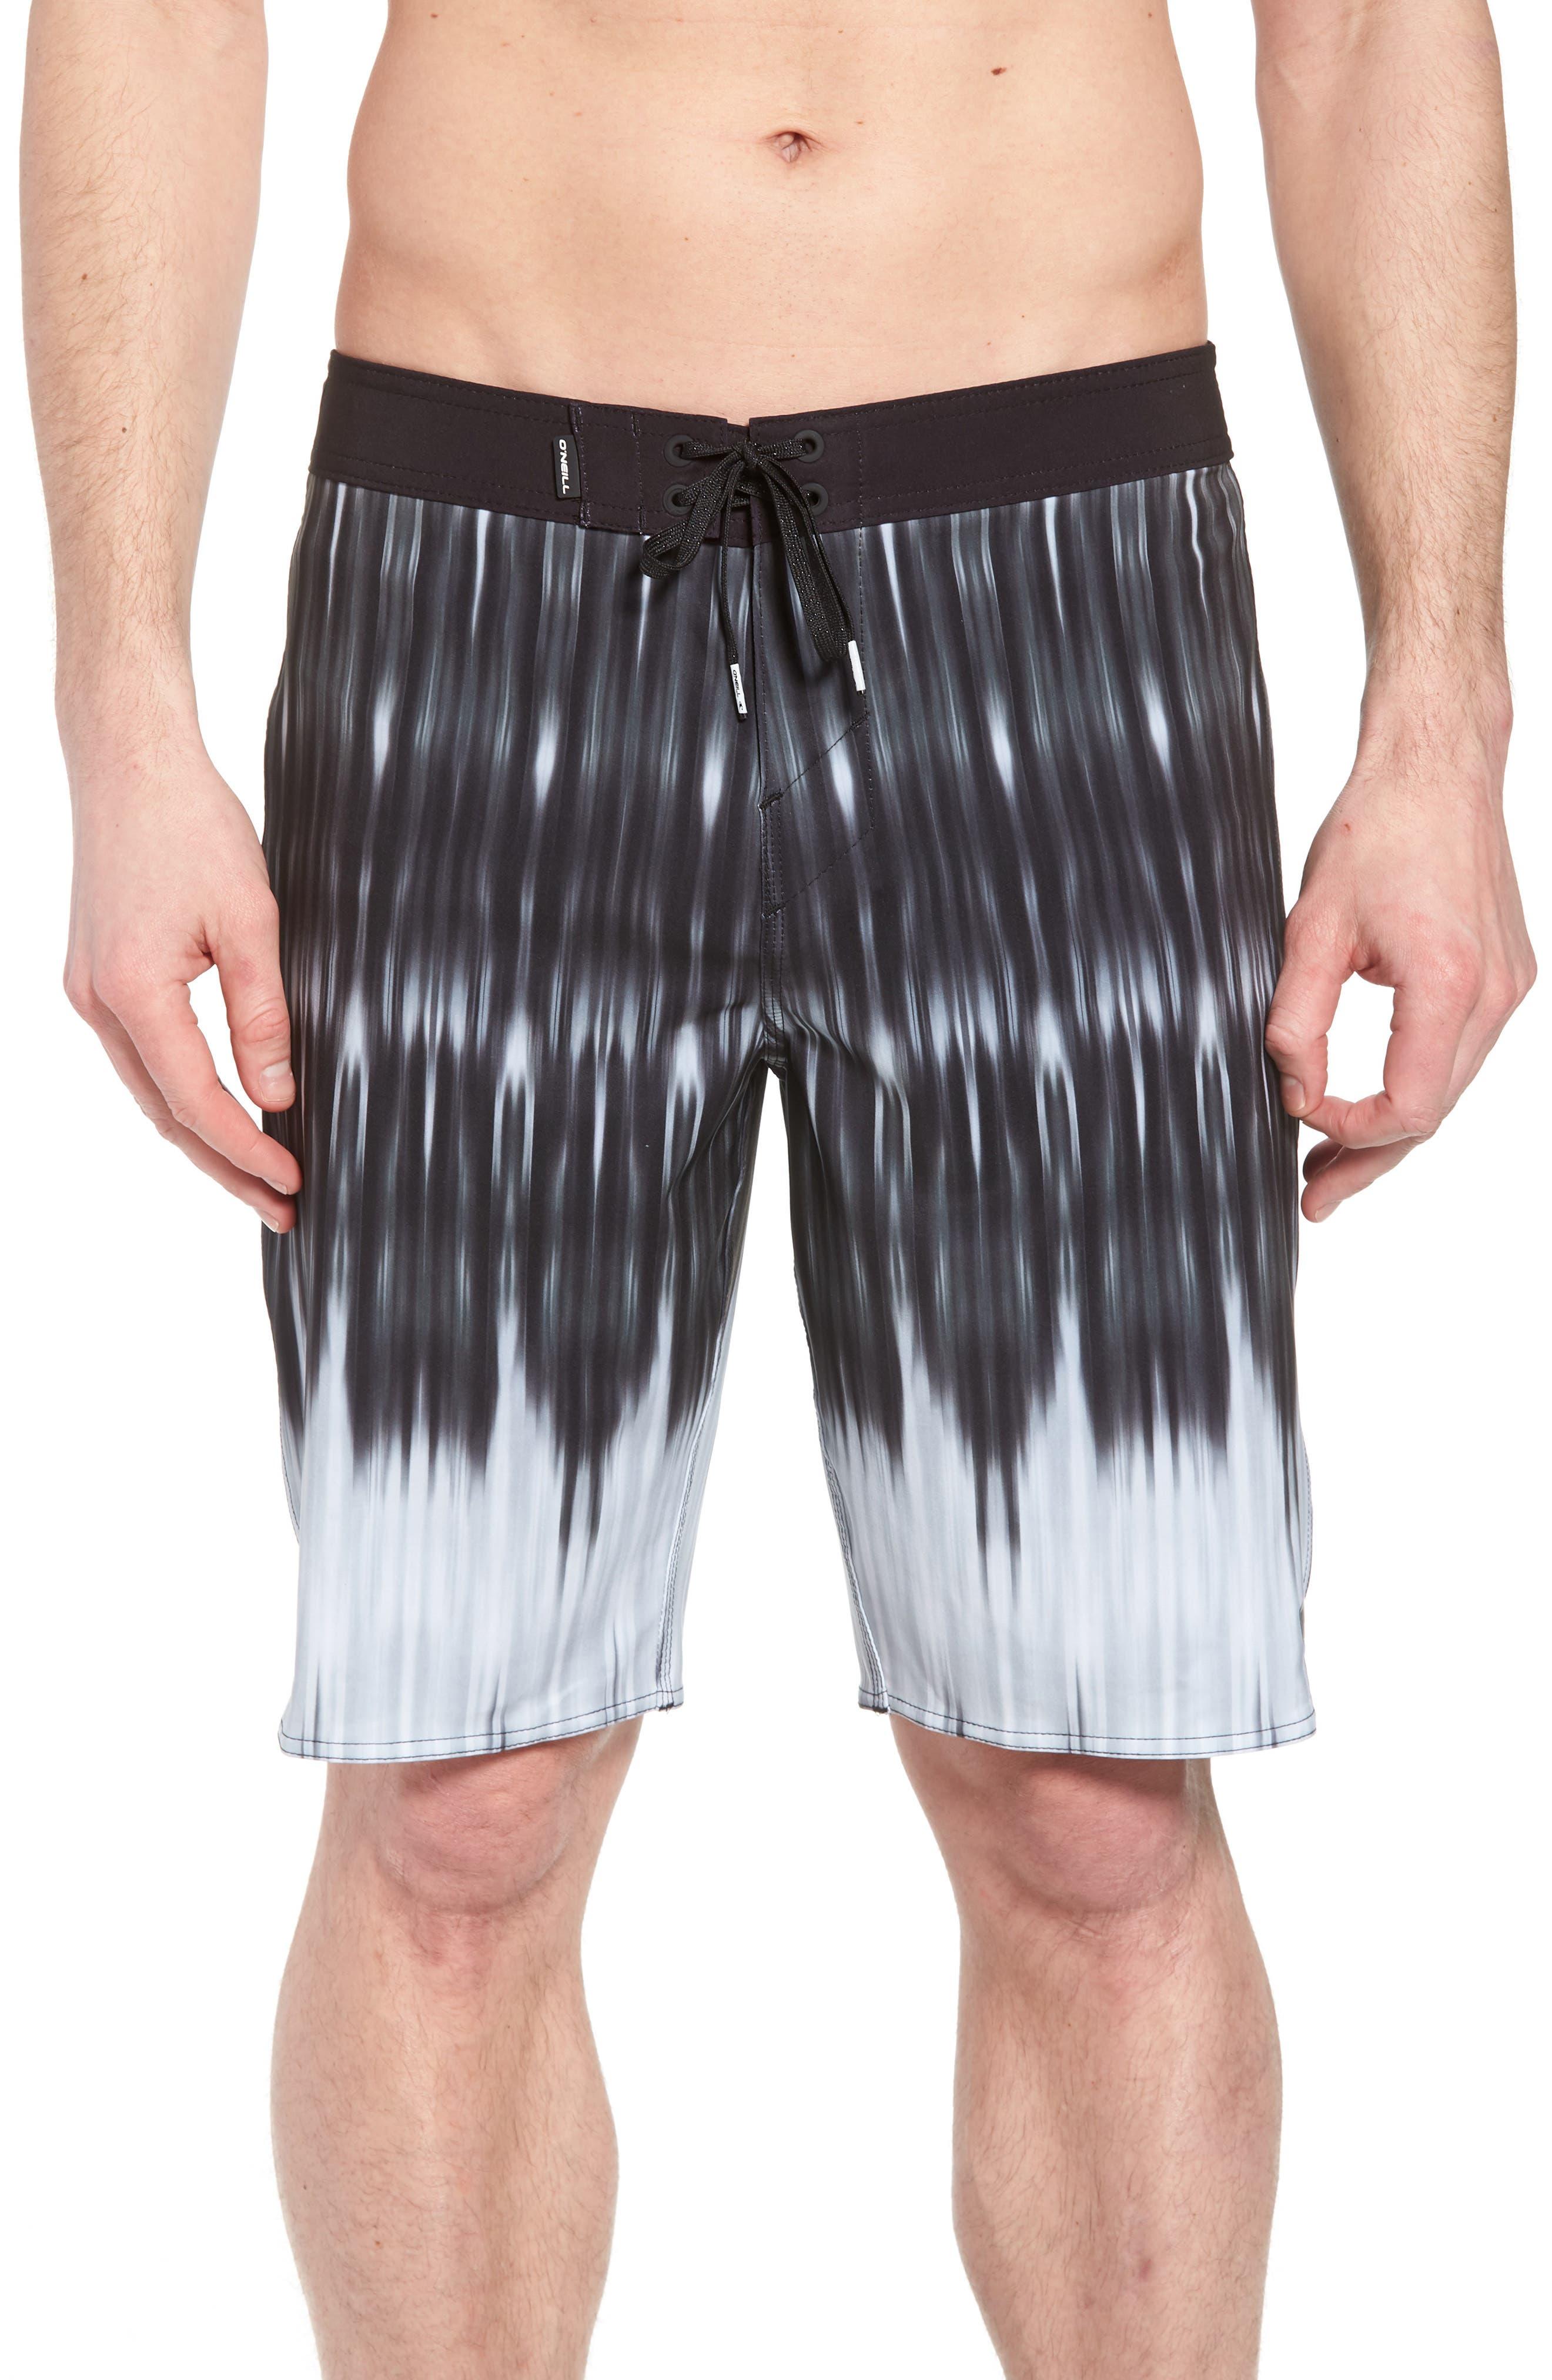 Superfreak Dimension Board Shorts,                             Main thumbnail 1, color,                             Black